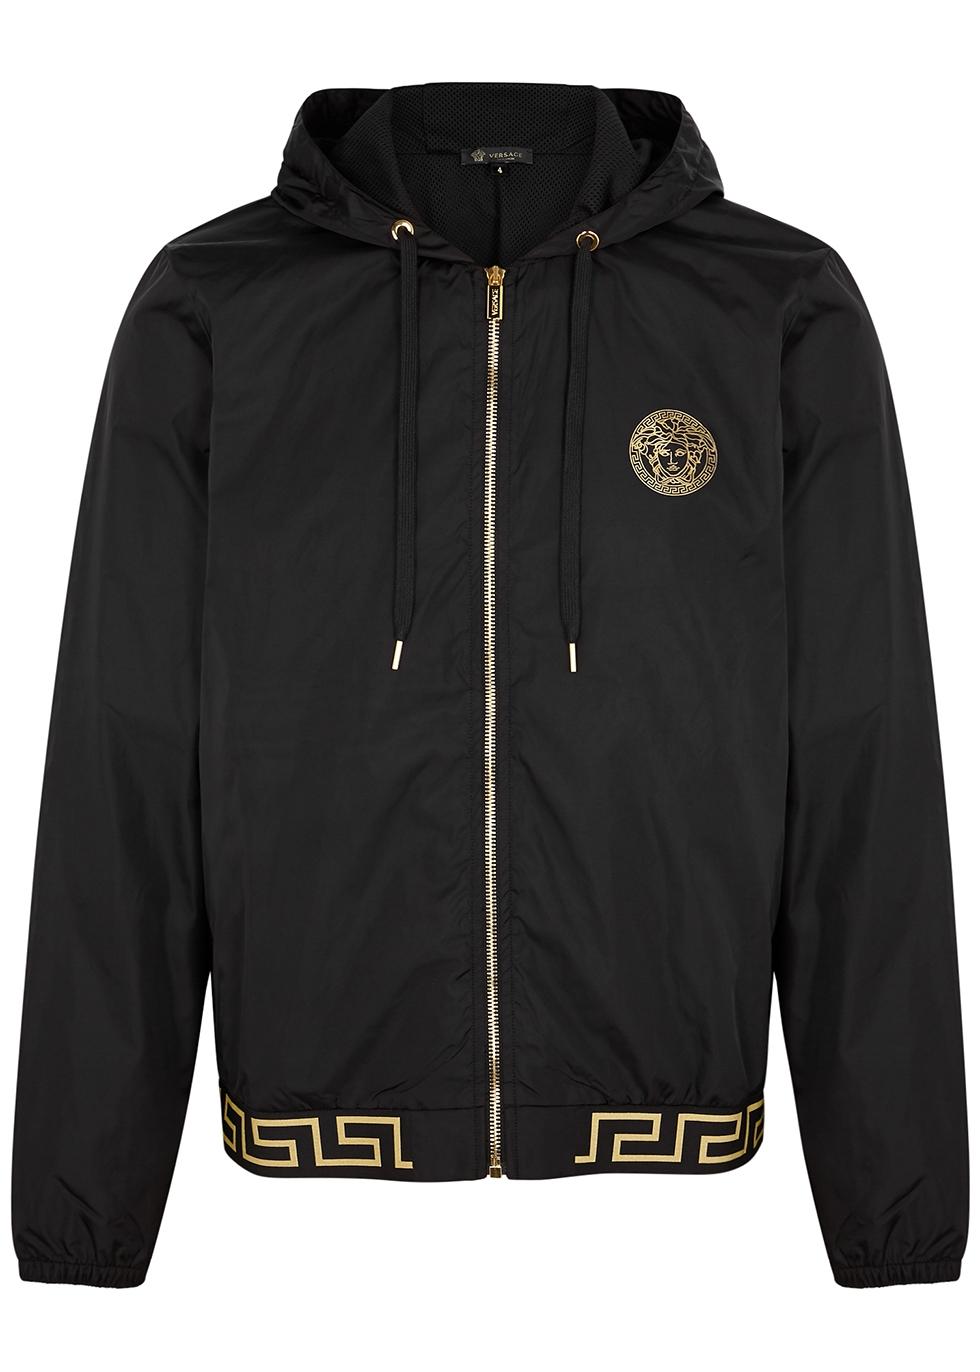 Black hooded shell jacket